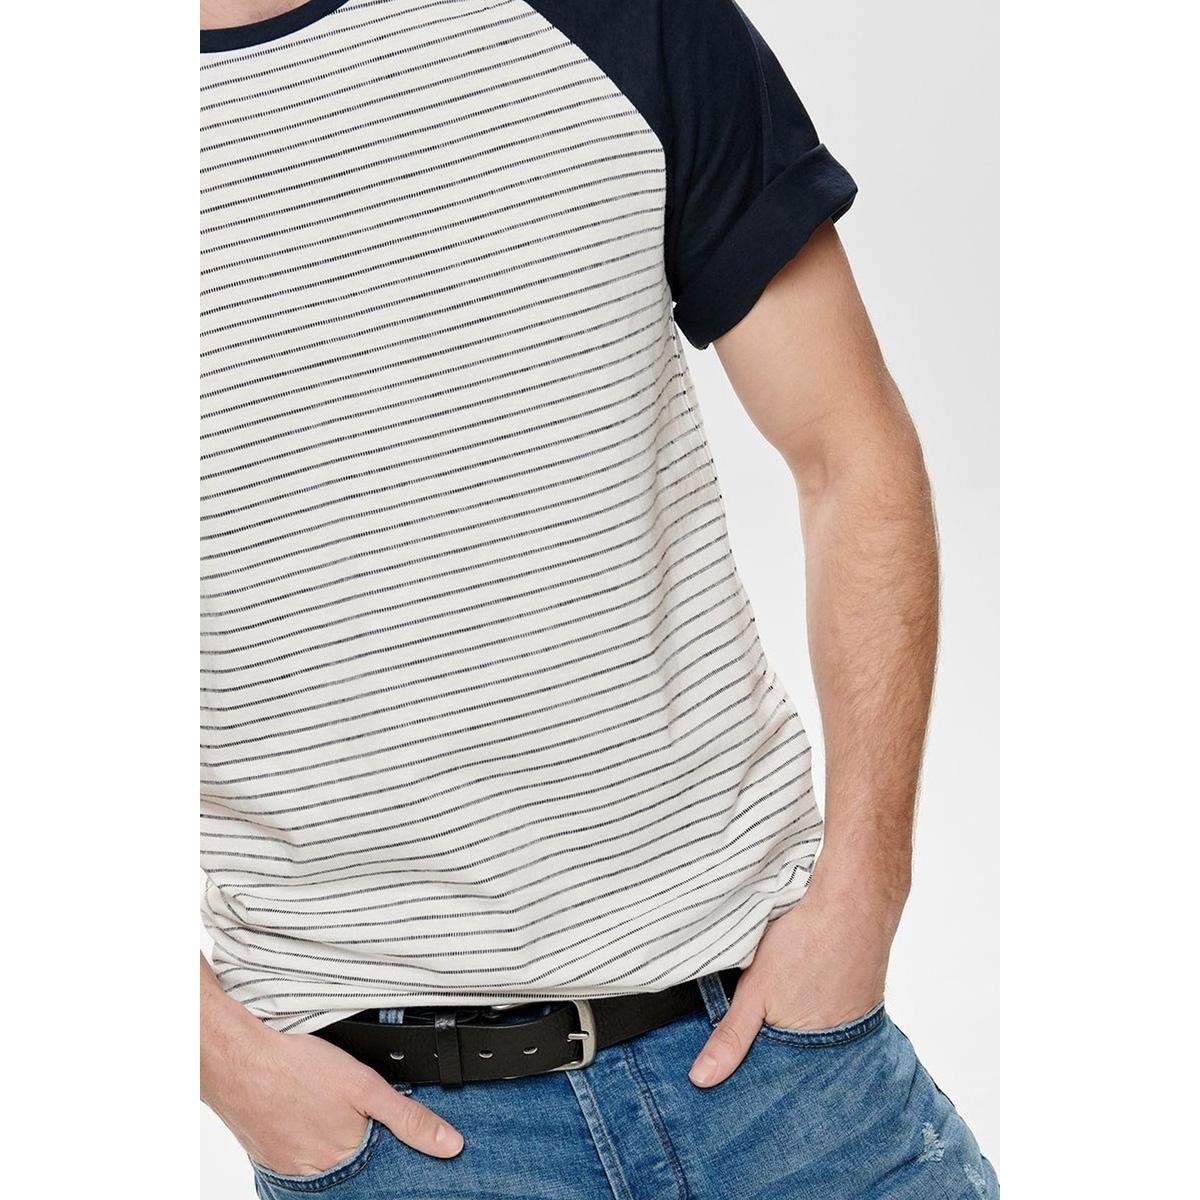 onselias jaquard ss reg tee 22012206 only & sons t-shirt cloud dancer/navy stripes